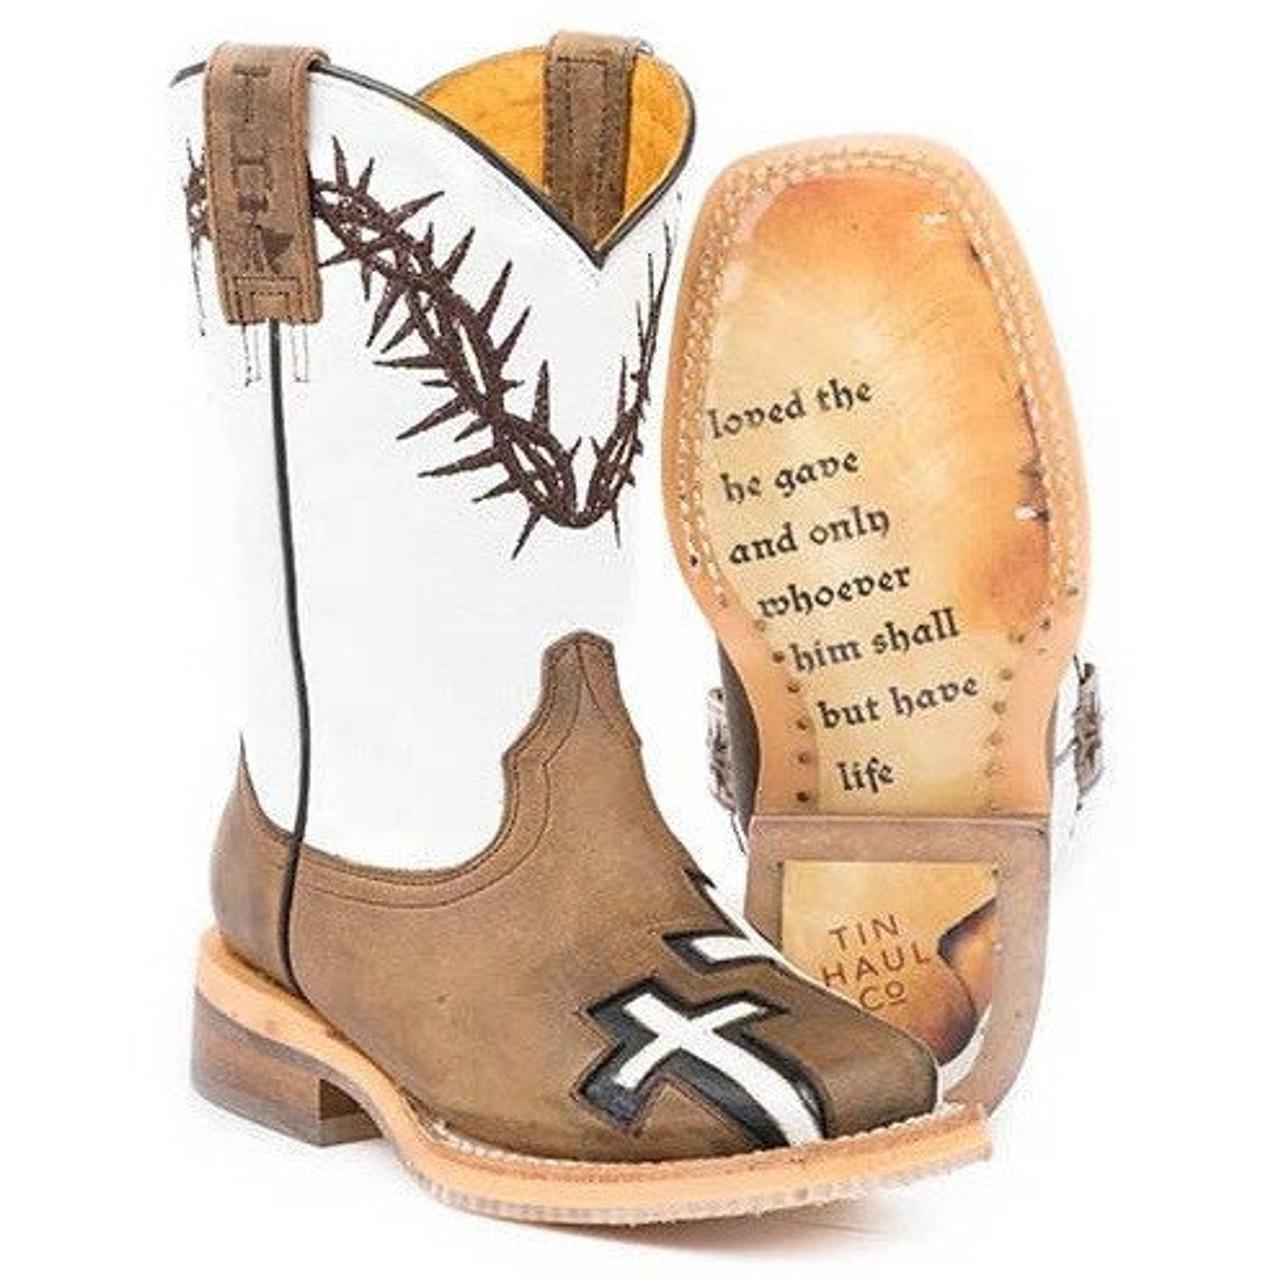 Kids Tin Haul Crosses Boots With Jonh 3